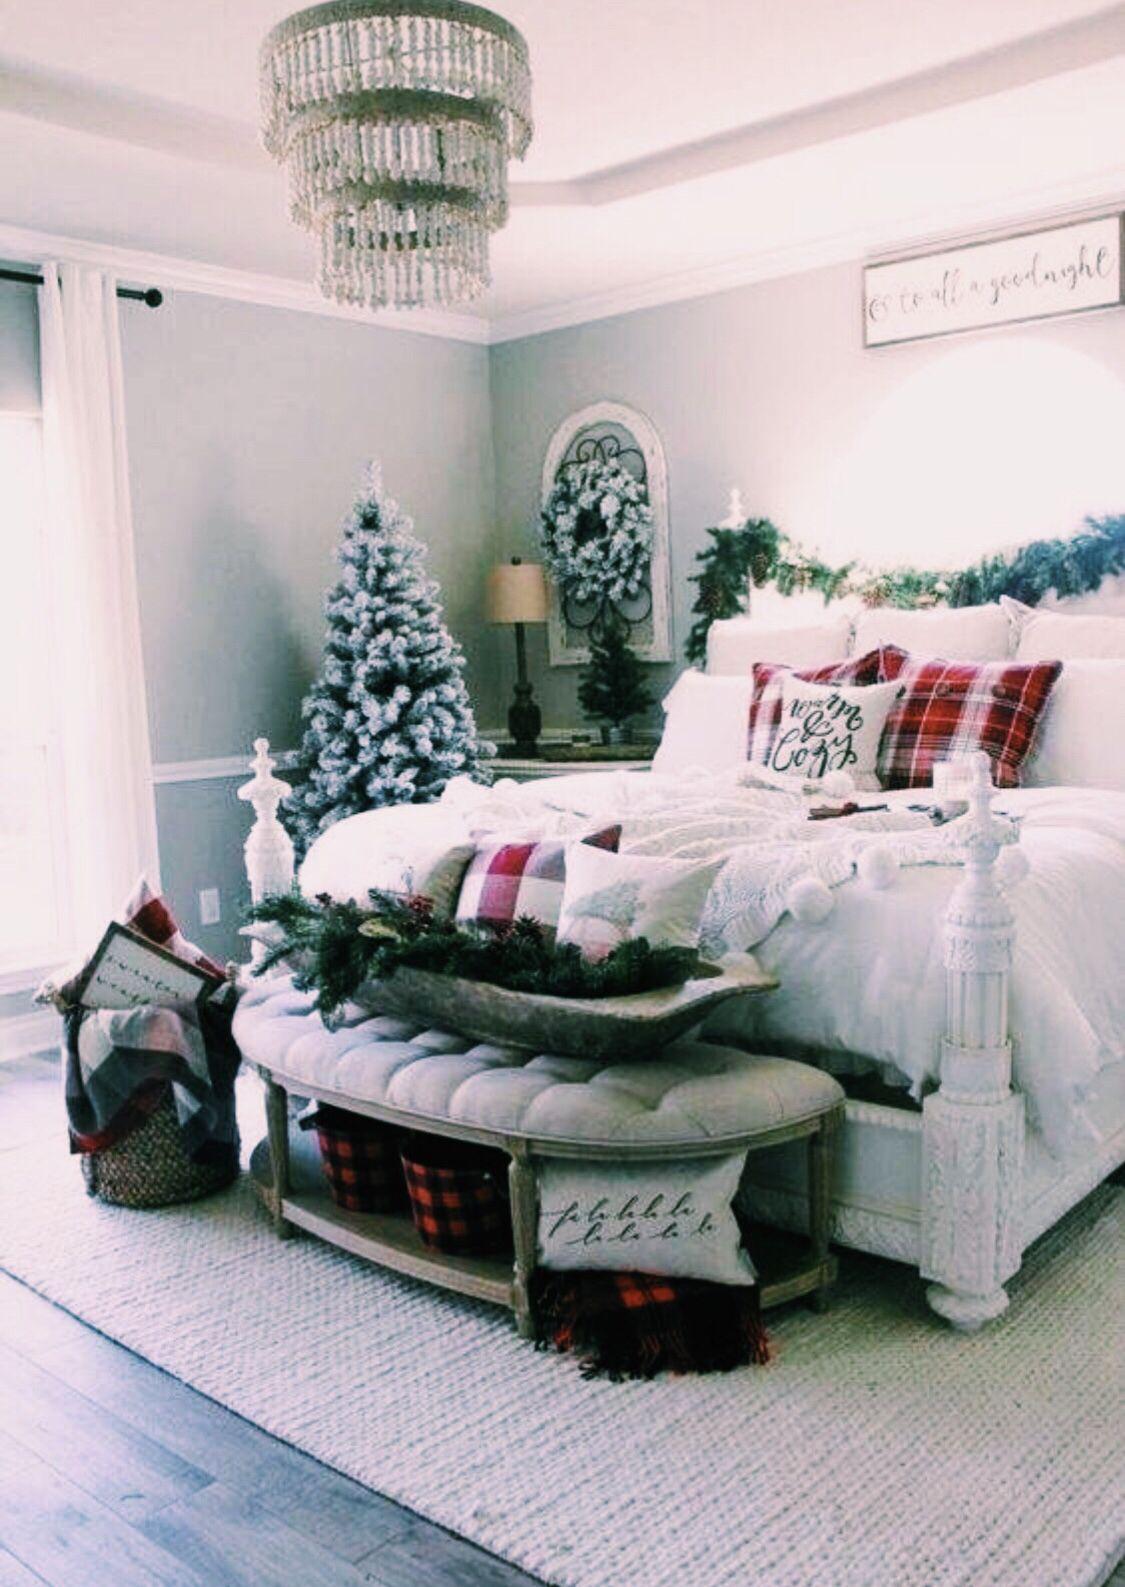 Pinterest carolinefaith417★ Christmas decorations